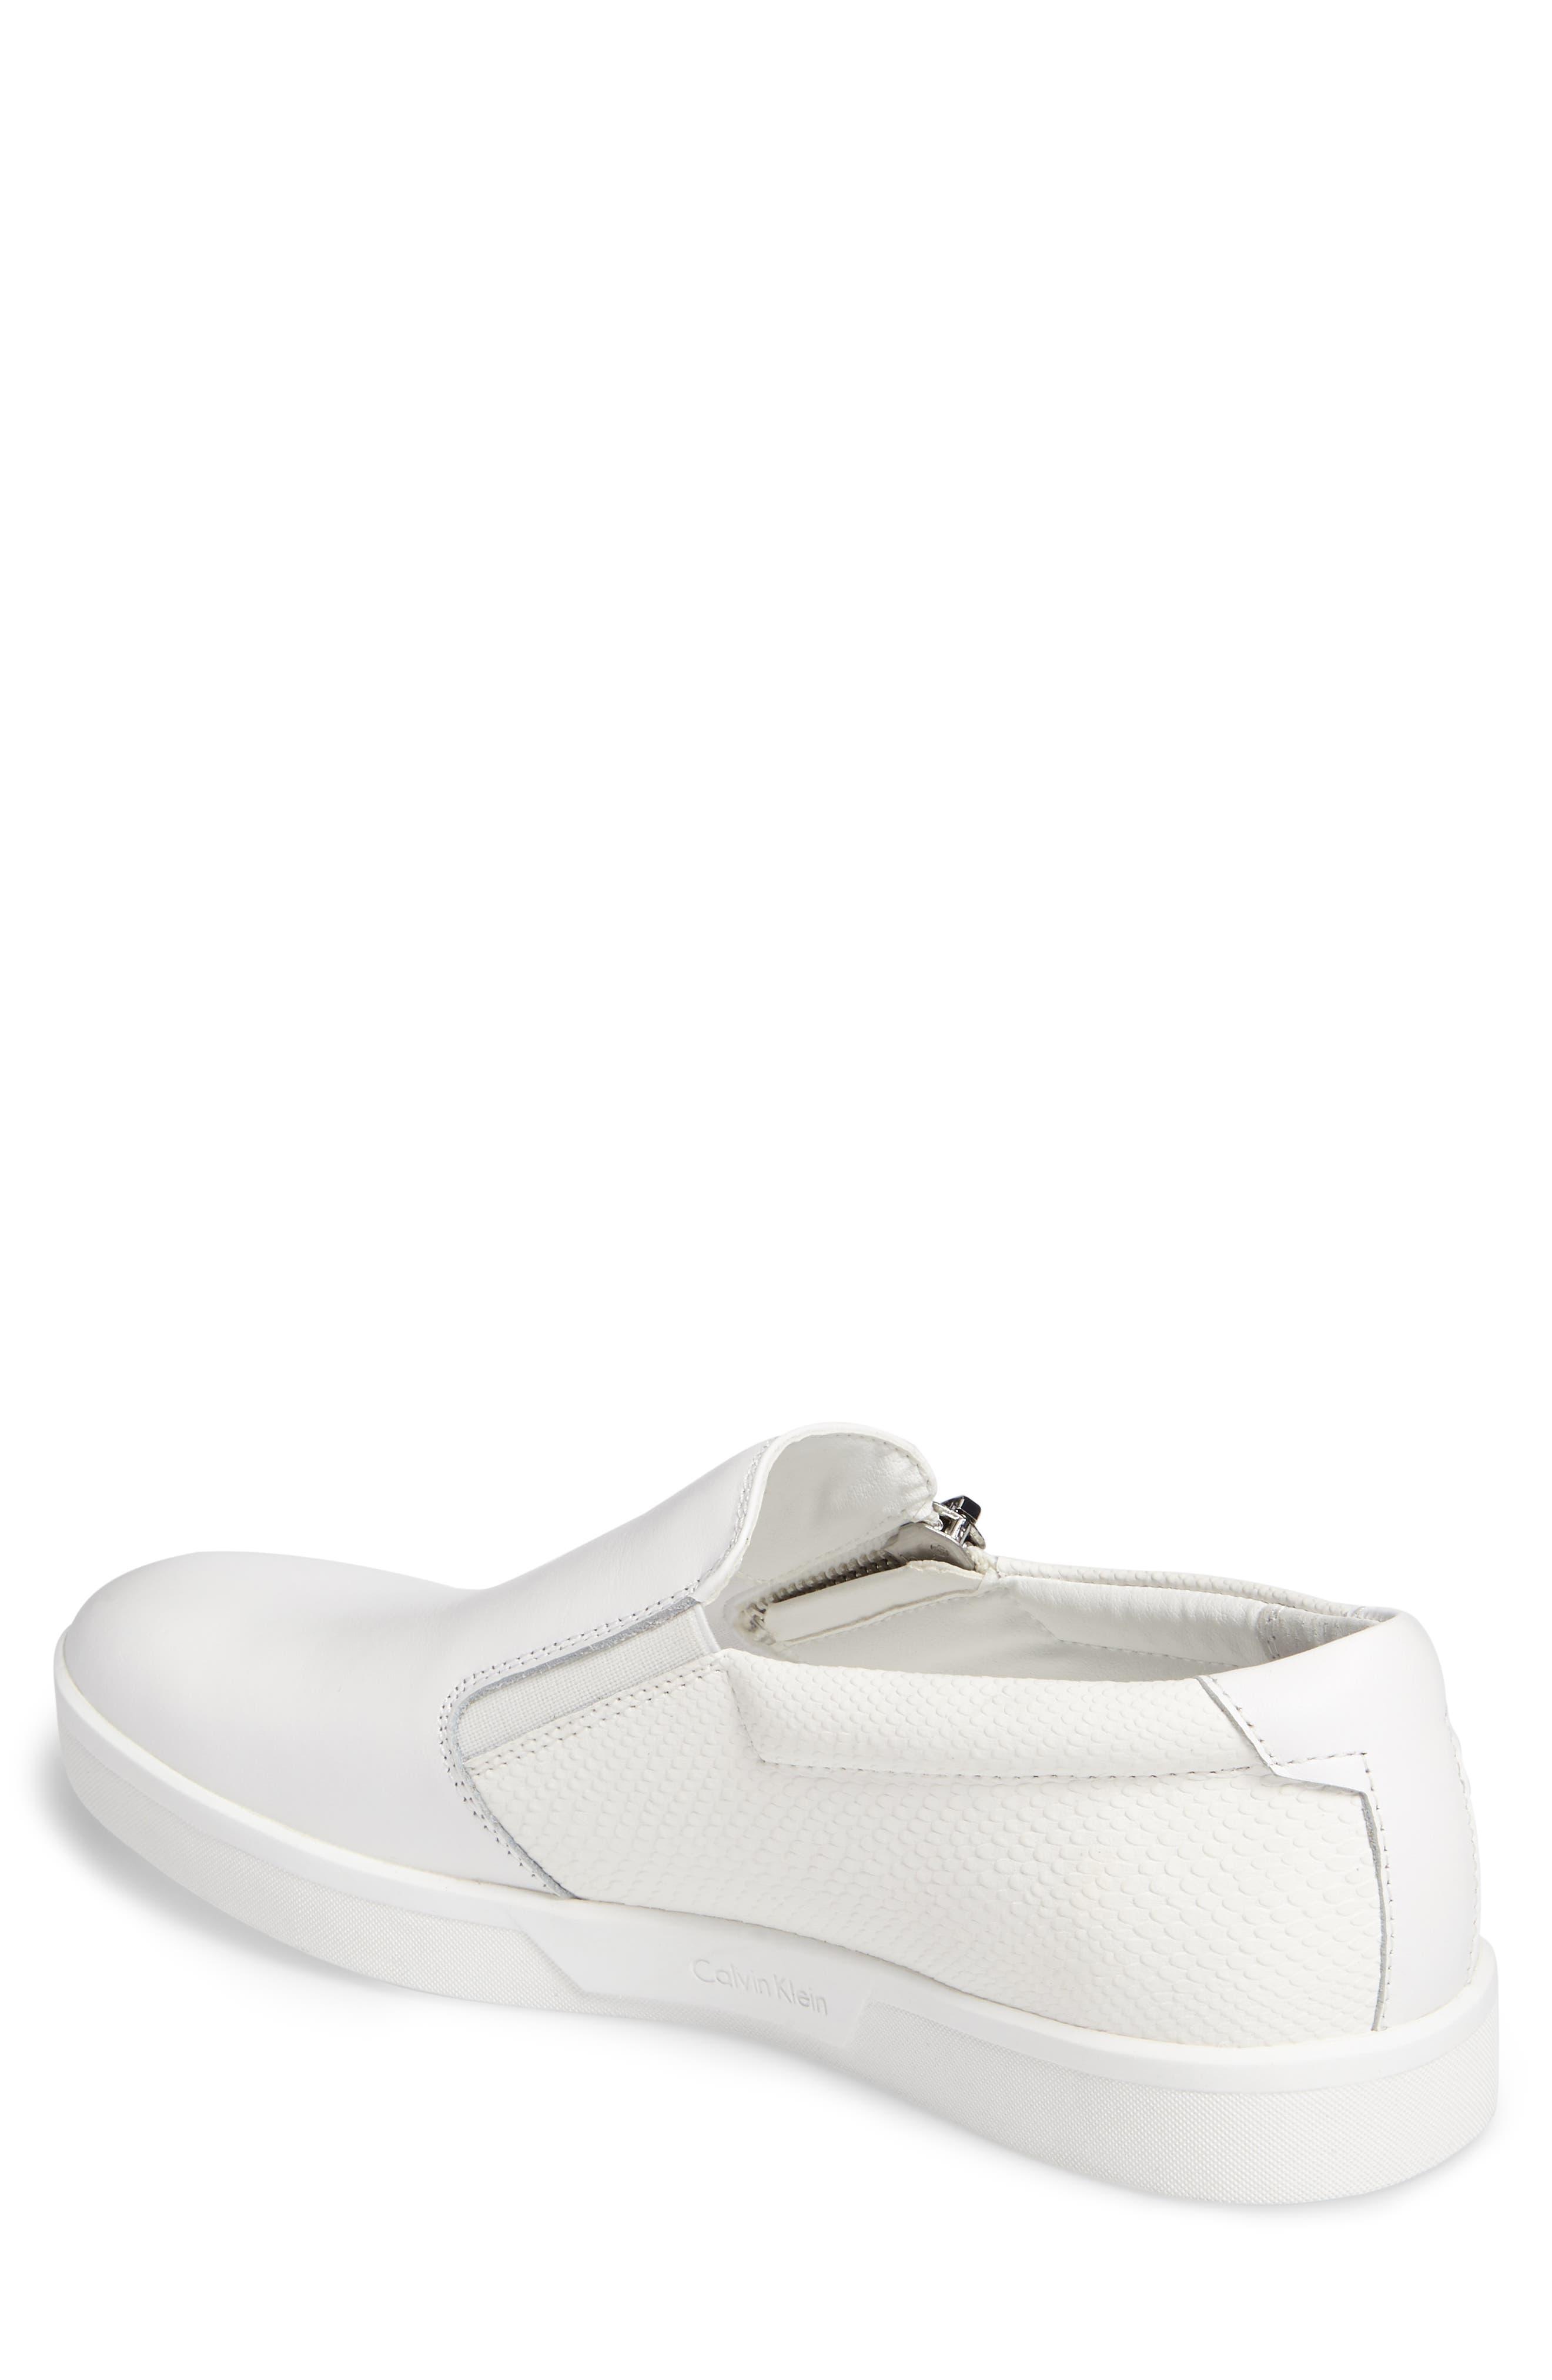 Ibiza Slip-On Zip Sneaker,                             Alternate thumbnail 2, color,                             White Leather